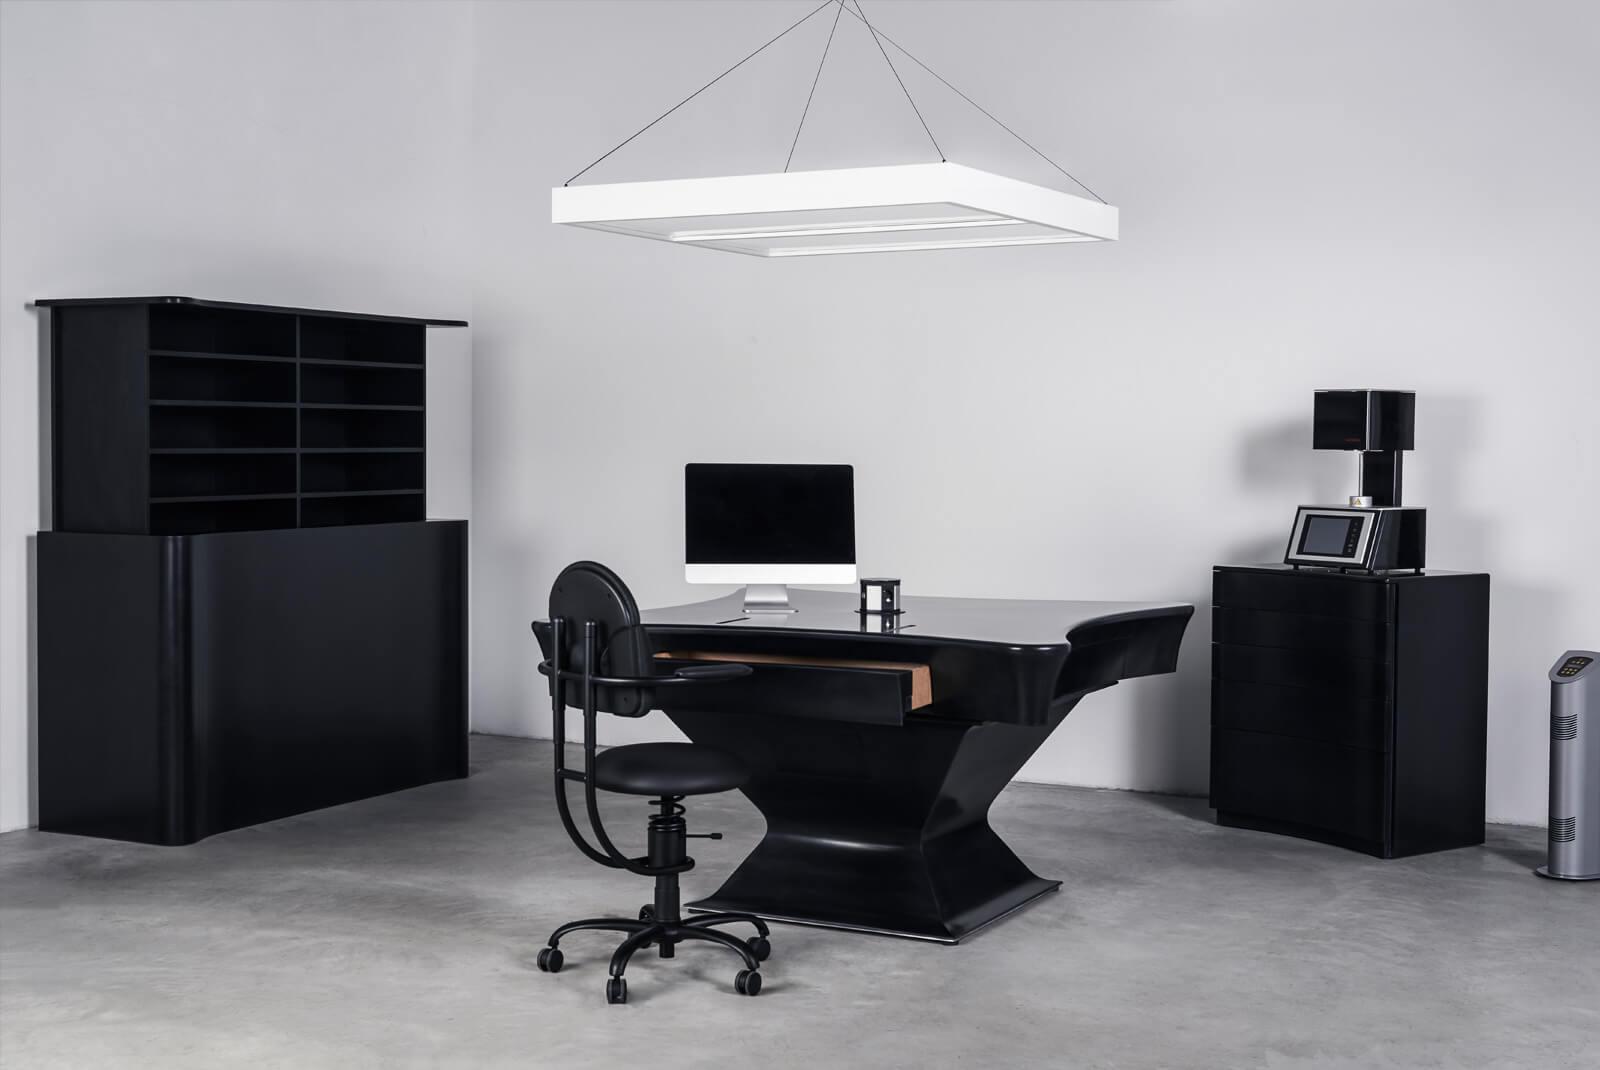 foryou-high-quality-mobili-accessori-odontotecnici-pennelli-banchi-progetto-new-horizons